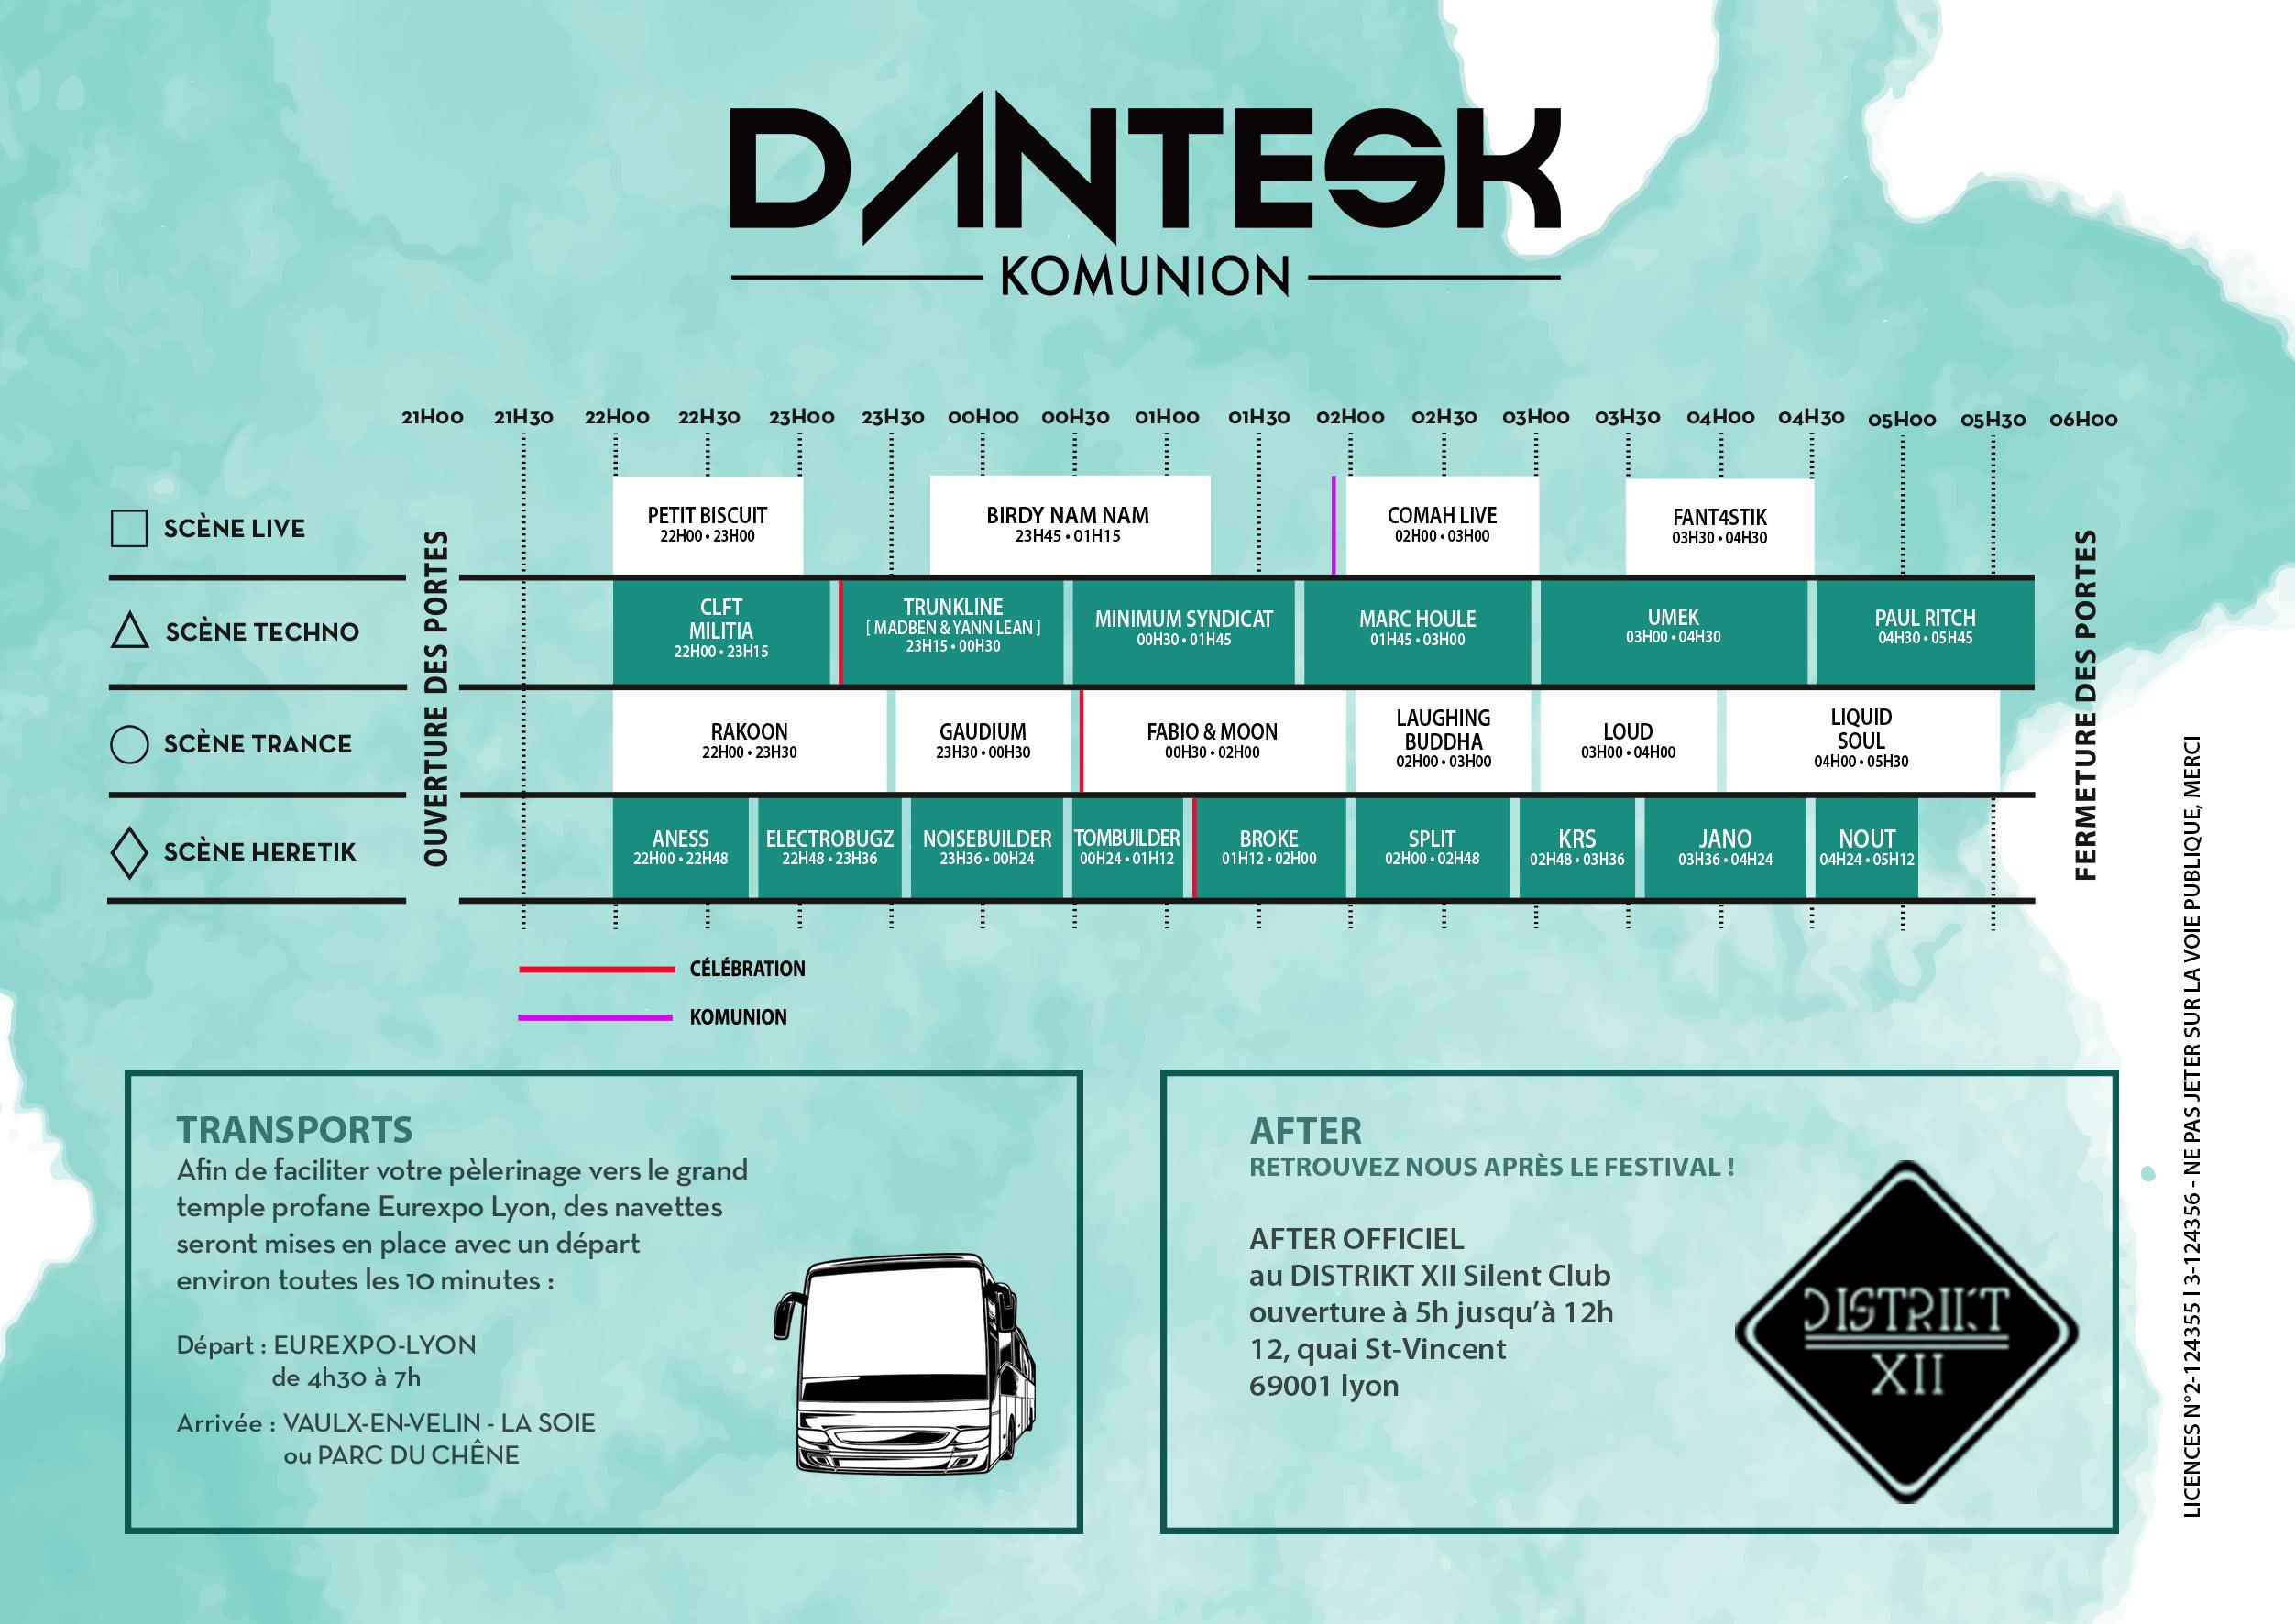 Timetable Dantesk Komunion